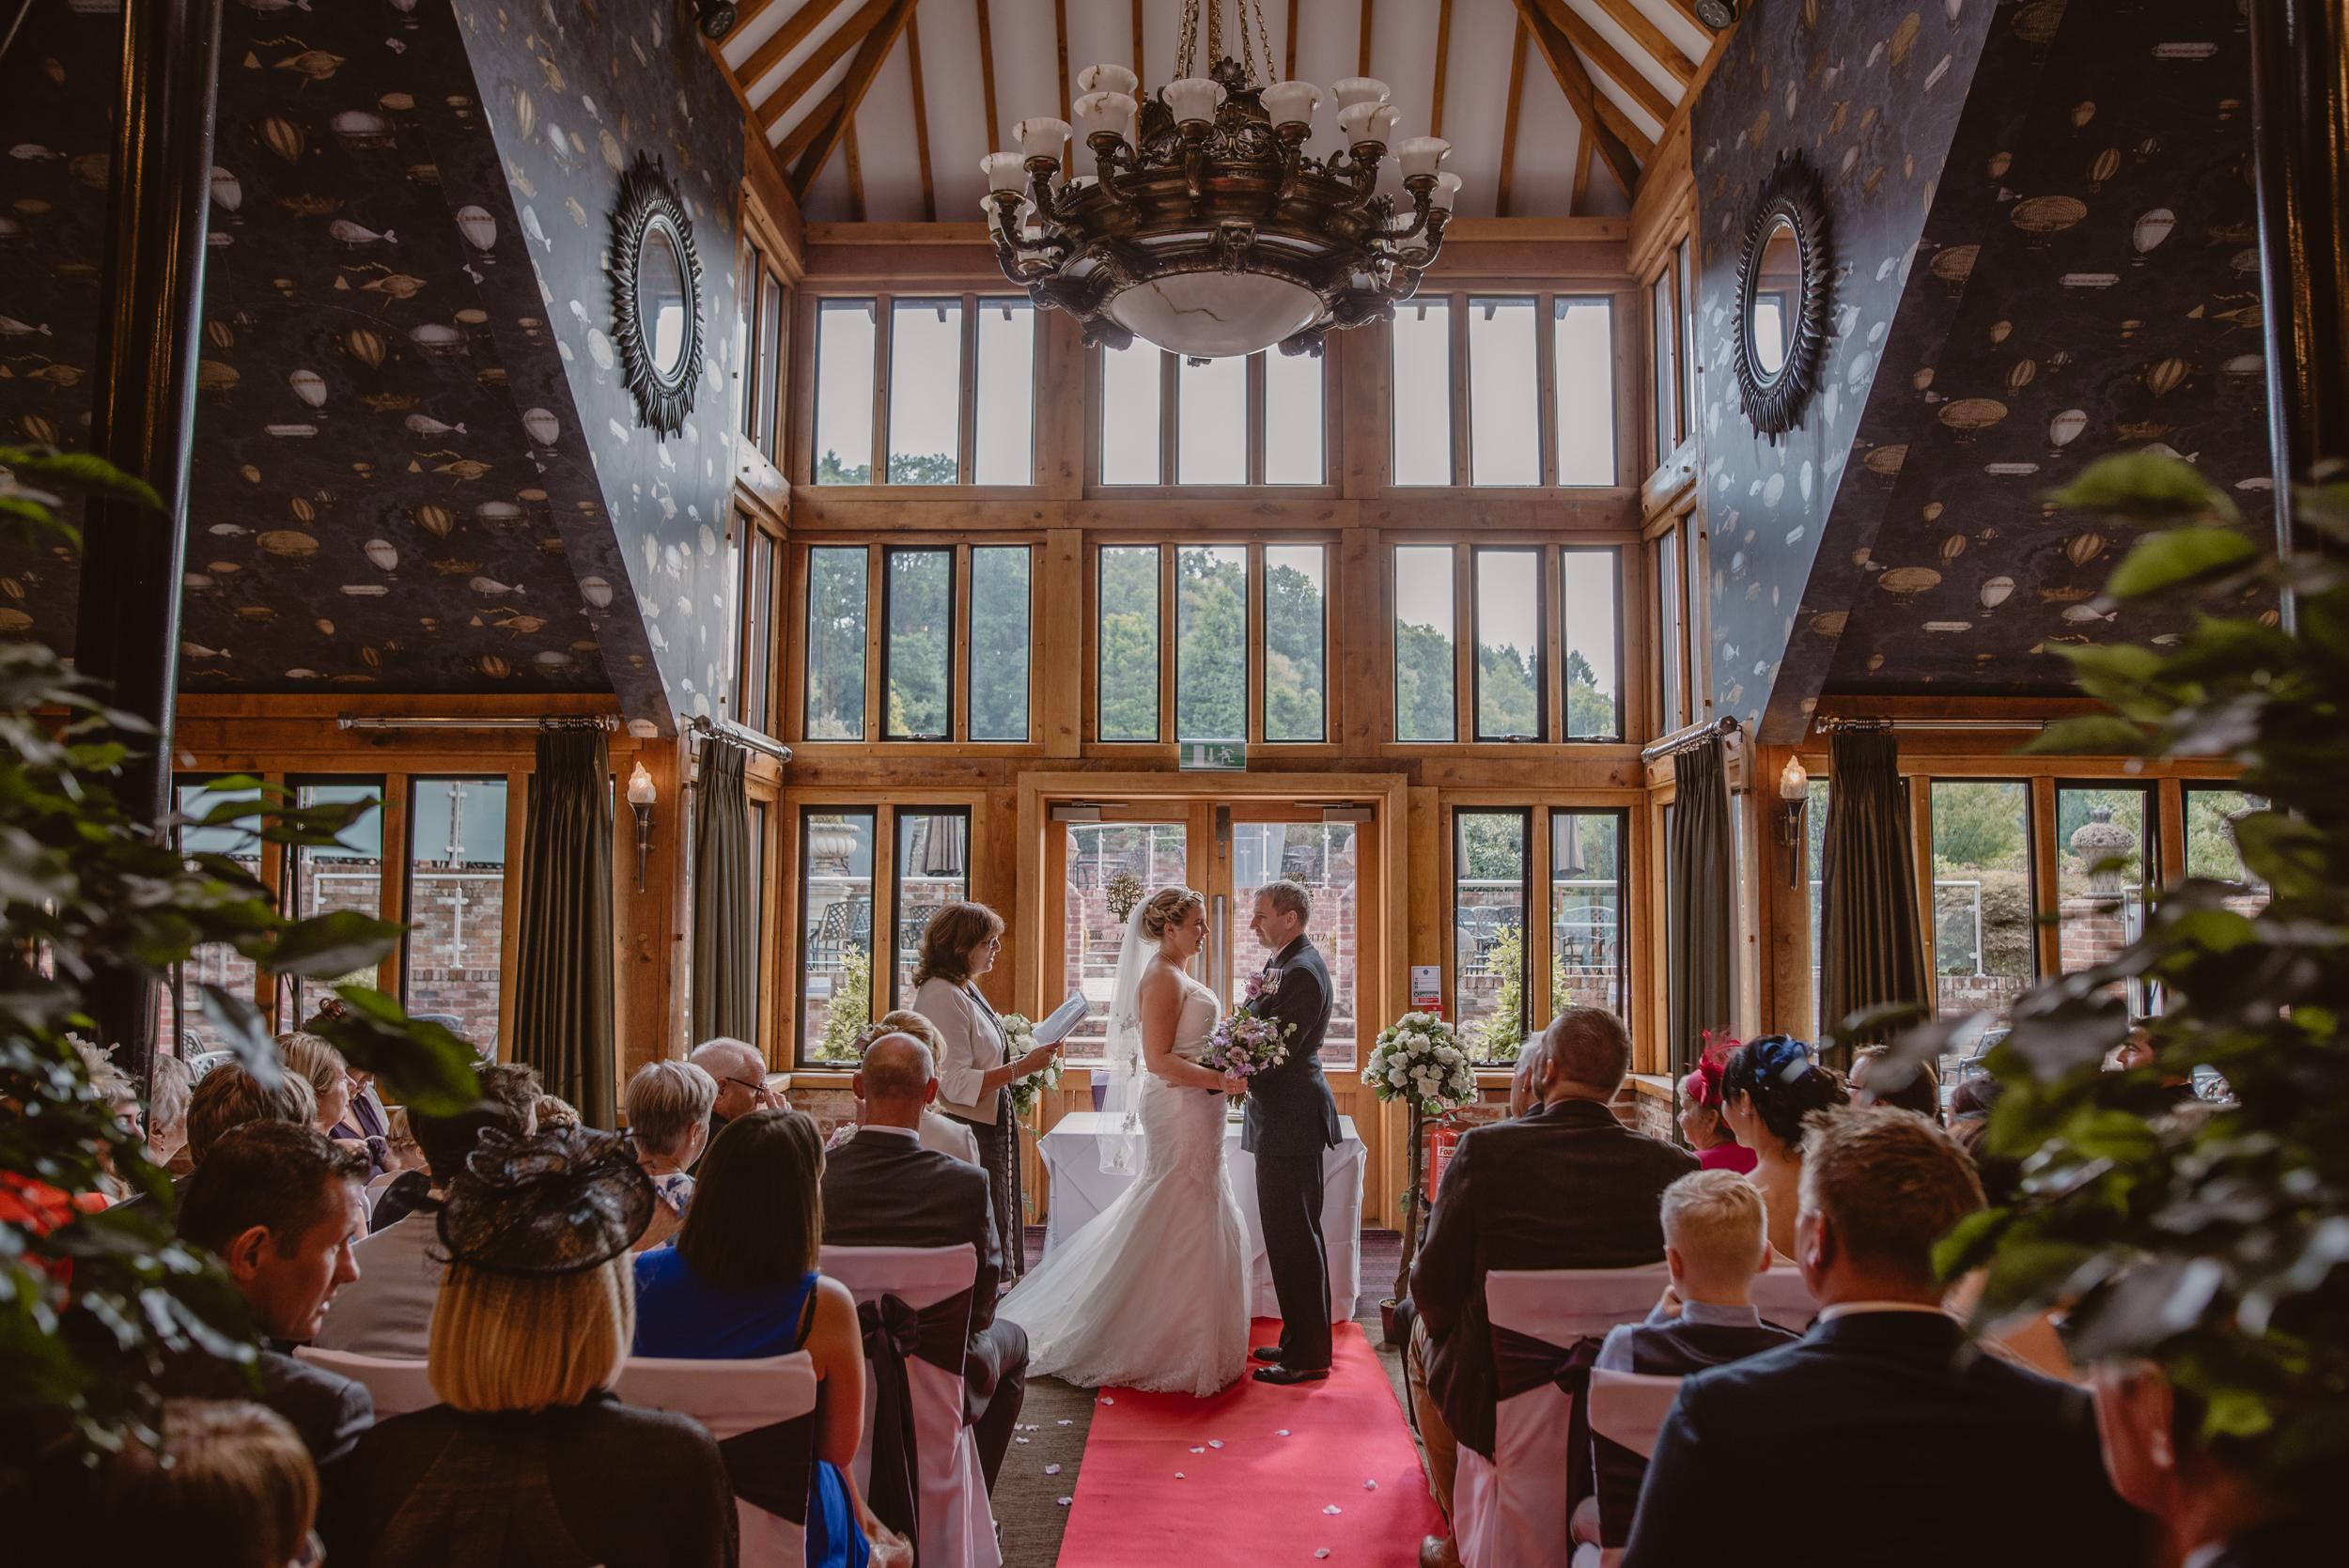 Chantelle-and-Stephen-Old-Thorns-Hotel-Wedding-Liphook-Manu-Mendoza-Wedding-Photography-244.jpg